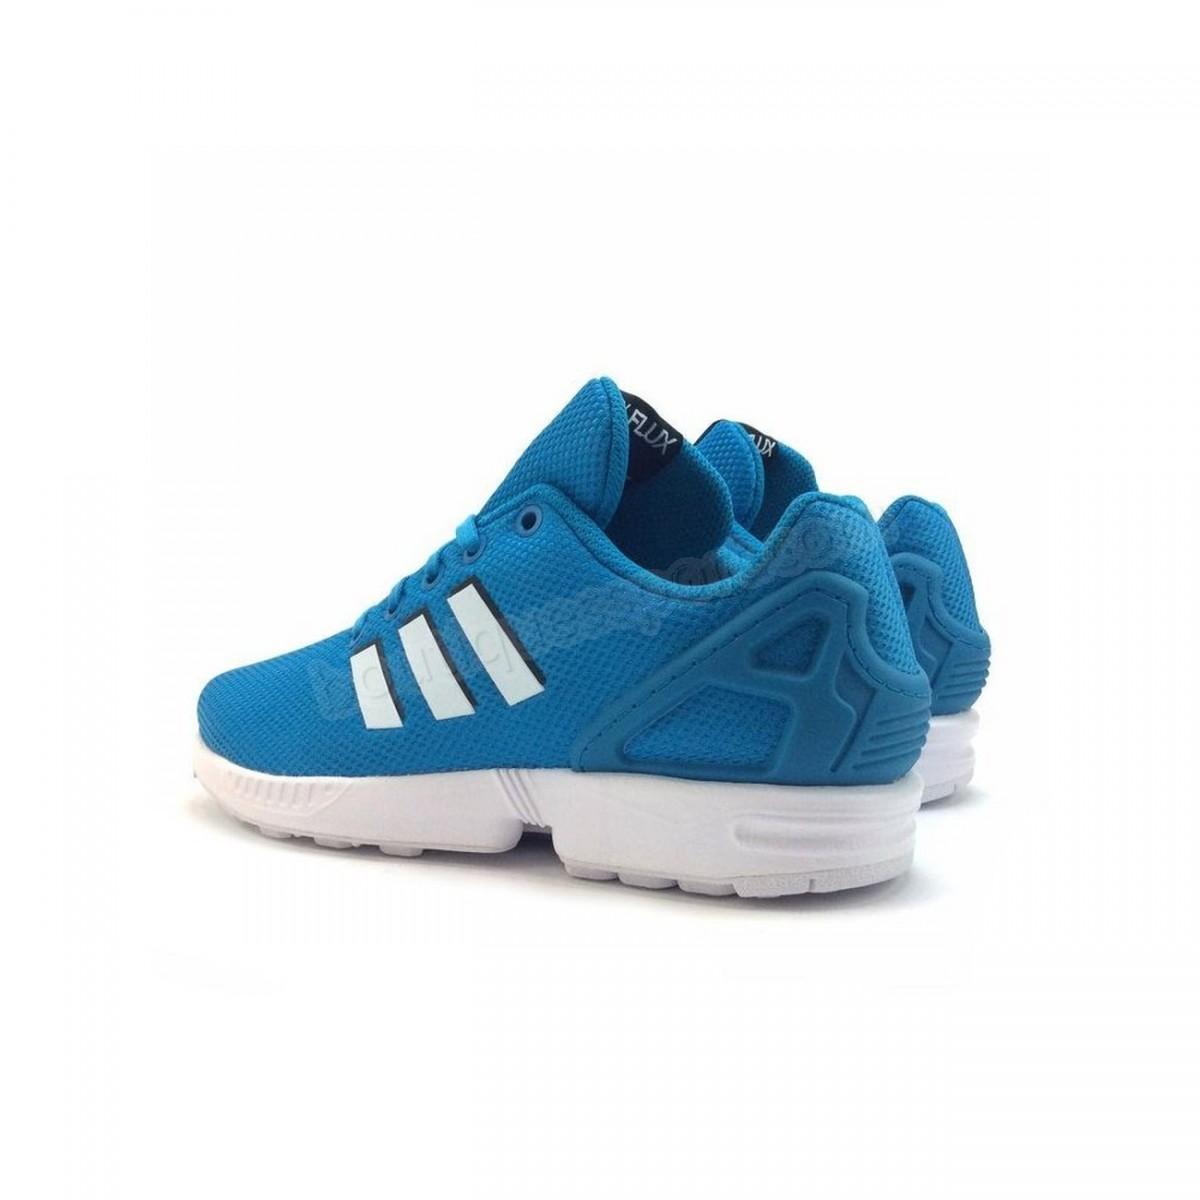 Tennis homme ADIDAS ORIGINALS Adidas Originals Zx Flux J Soldes - -0